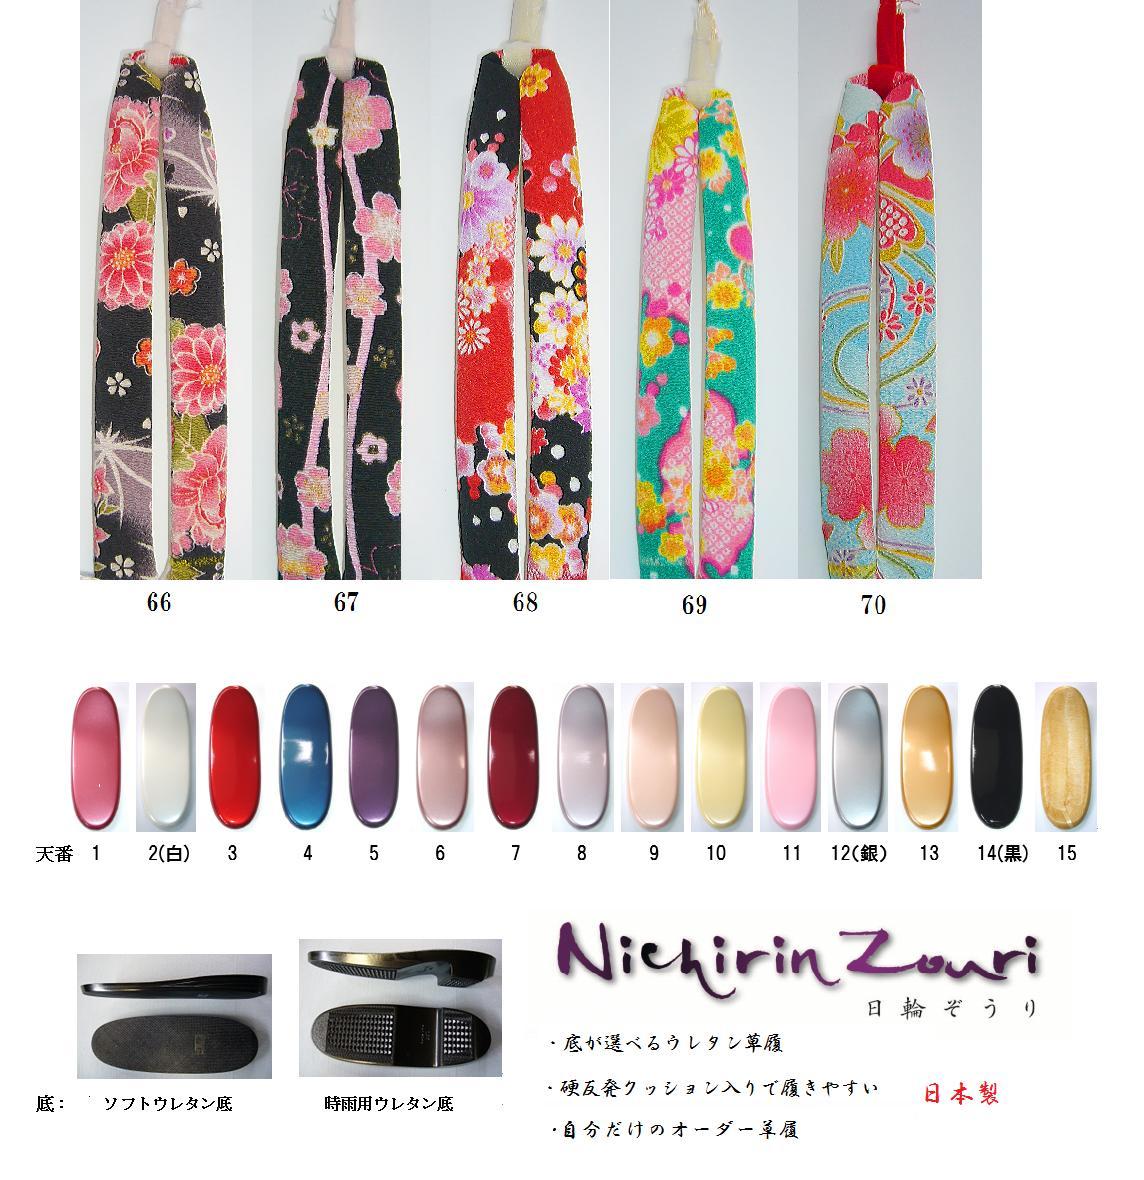 Choose from the bottom is urethane sandals! Nichirin Zouri-hinowa thongs-L(23.5cm) graduation ceremony, entrance ceremony, wedding, wedding reception, such as